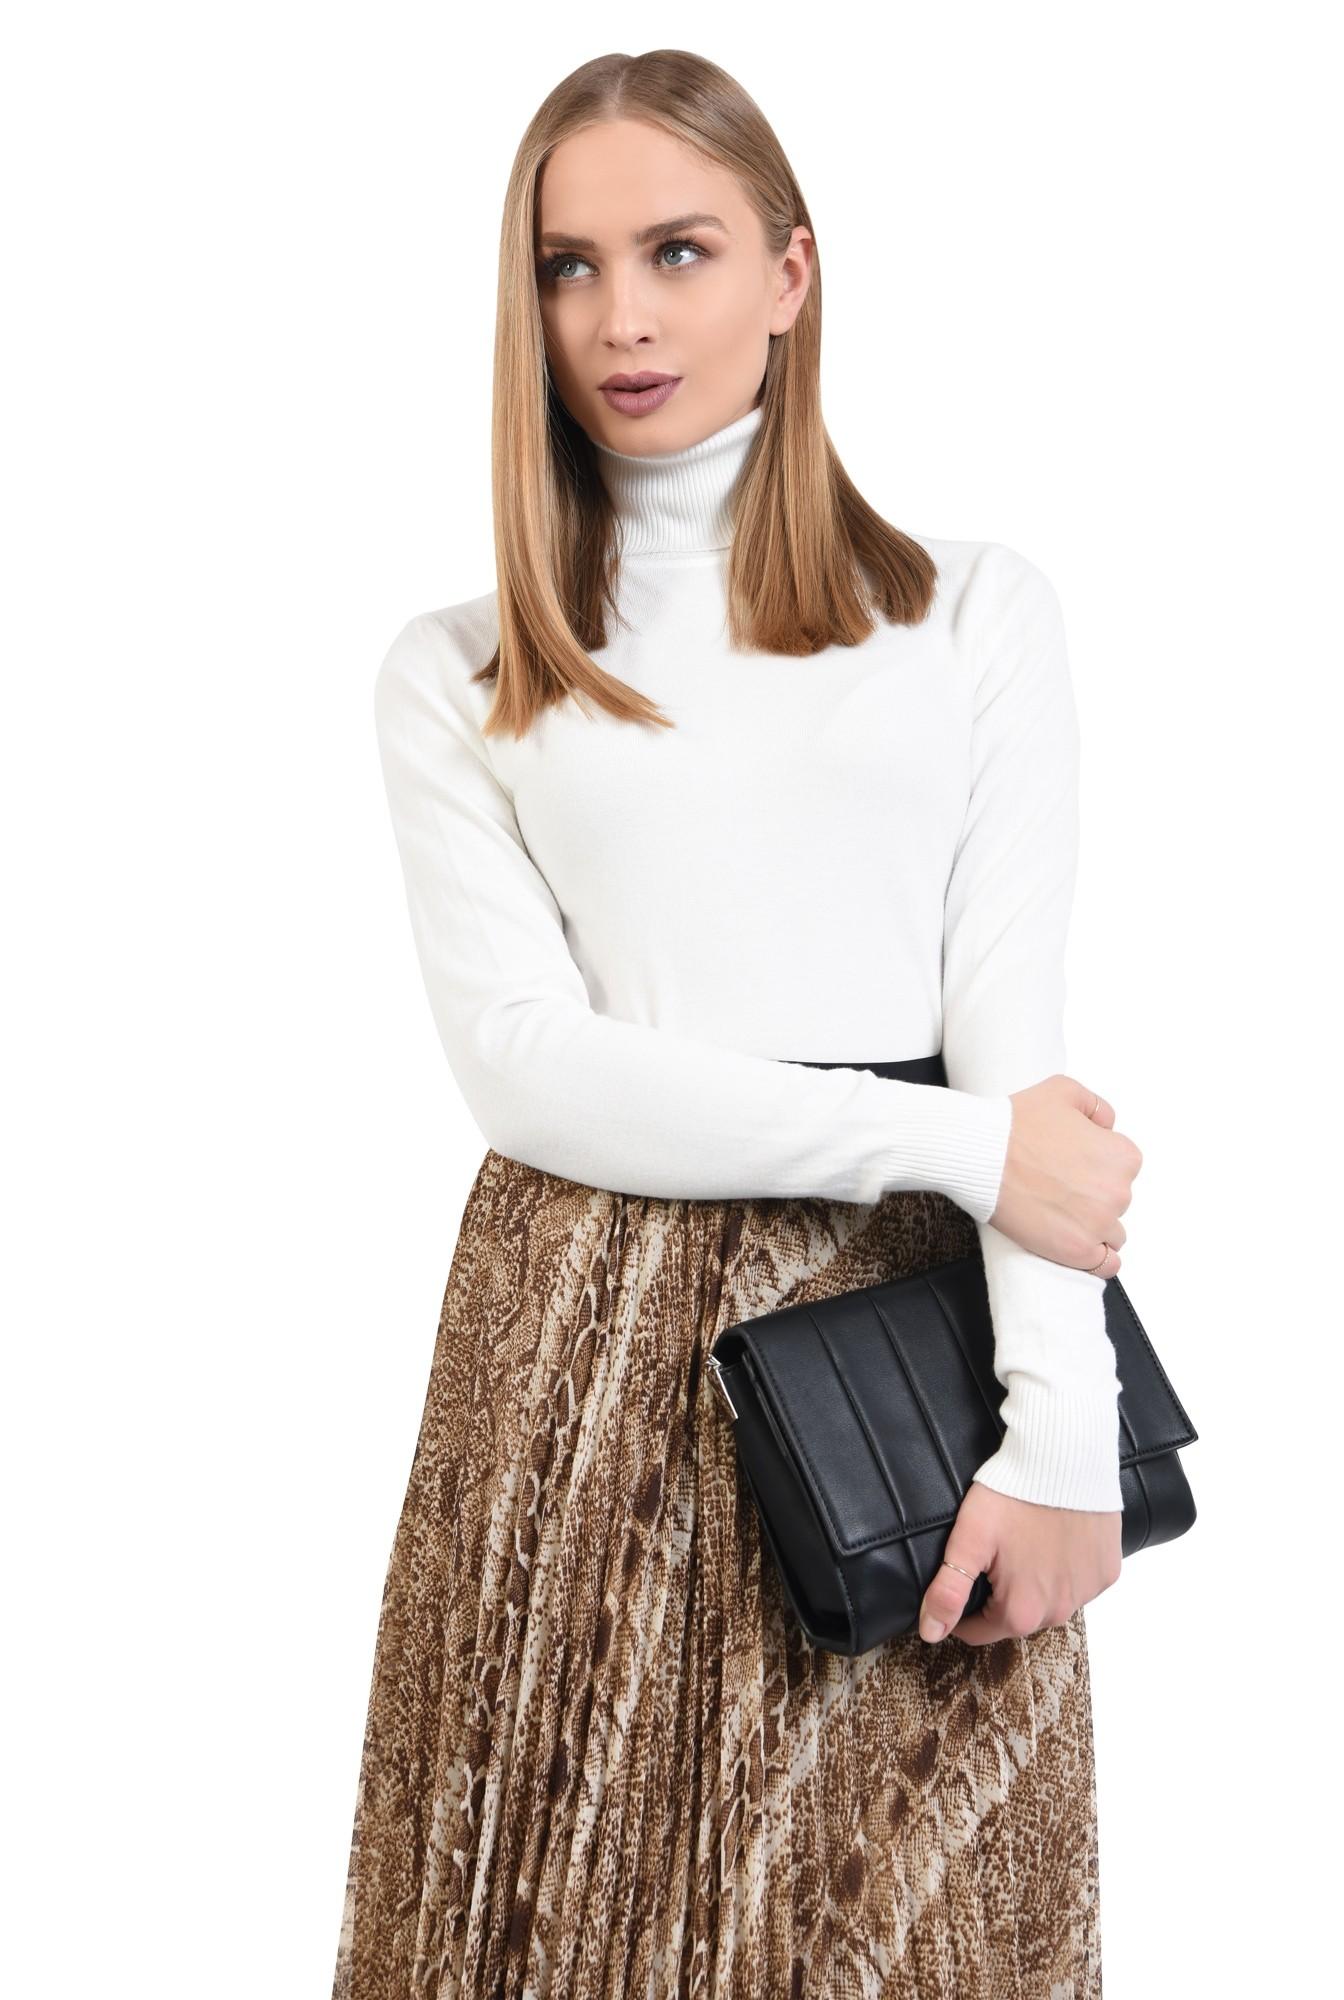 0 - pulover tip maleta, alb, borduri reiate, guler inalt, bluza tricotata